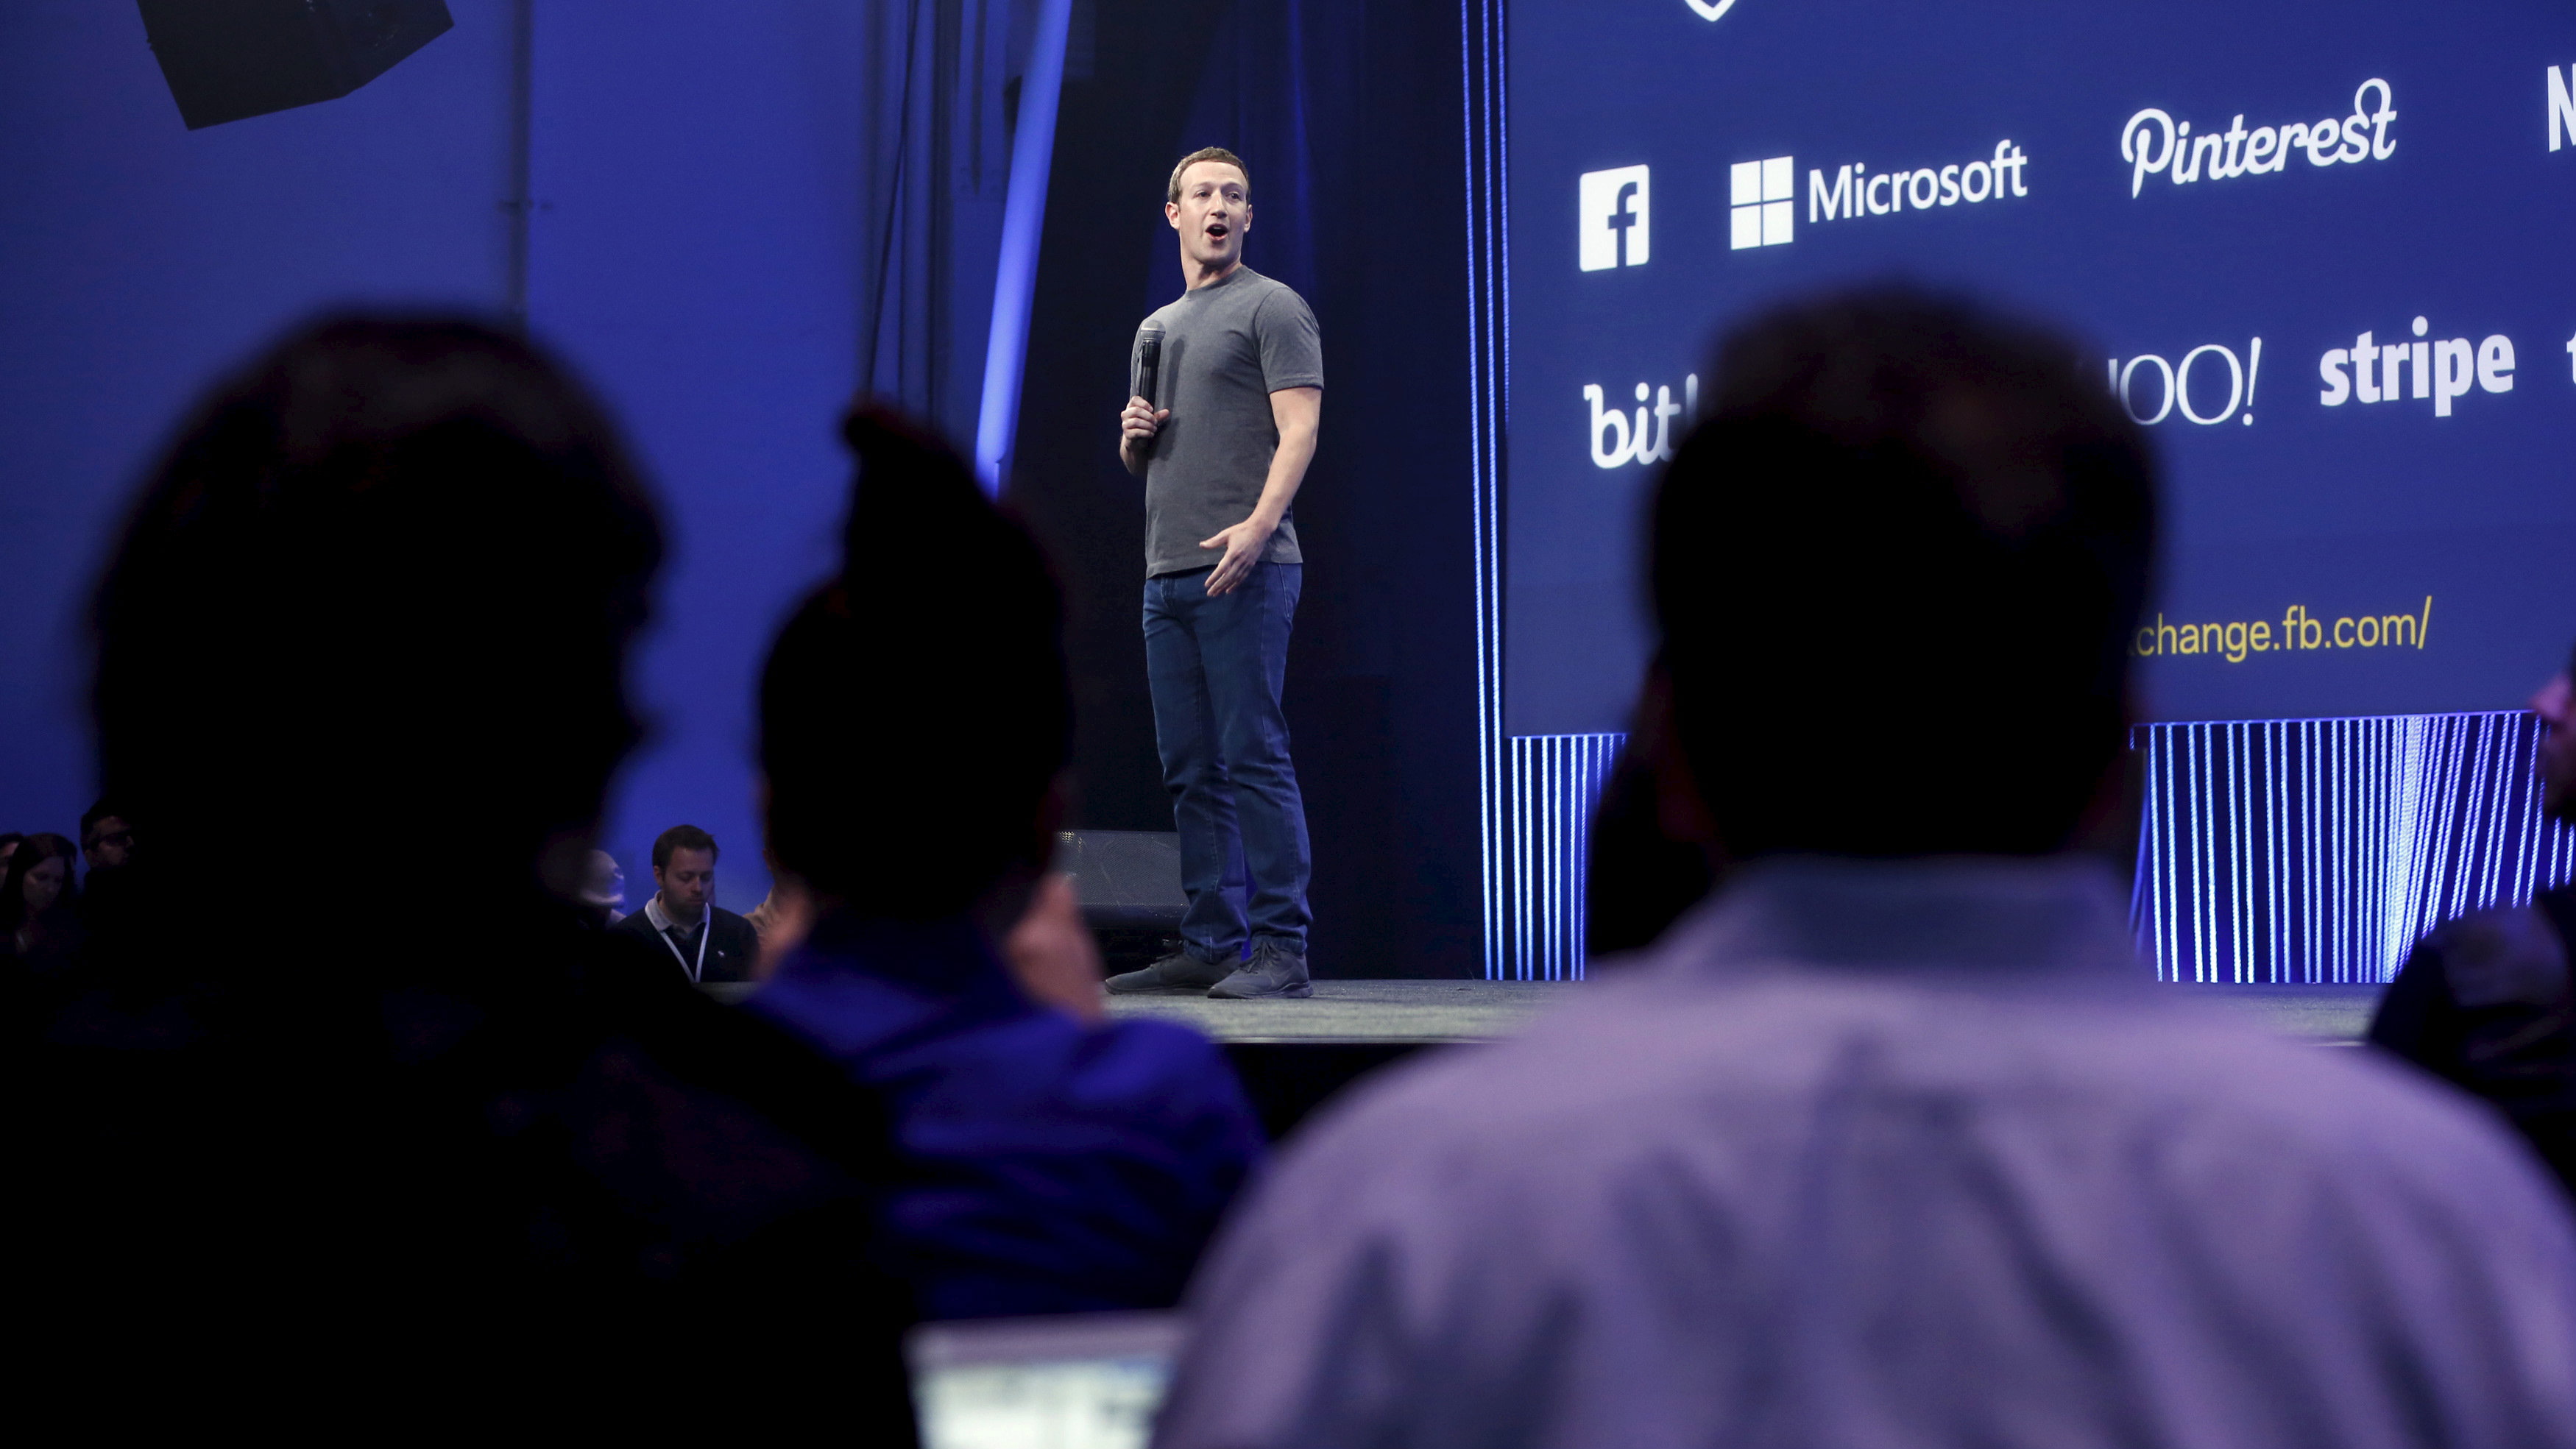 Facebook CEO Mark Zuckerberg speaks during his keynote address at Facebook F8 in San Francisco, California March 25, 2015.